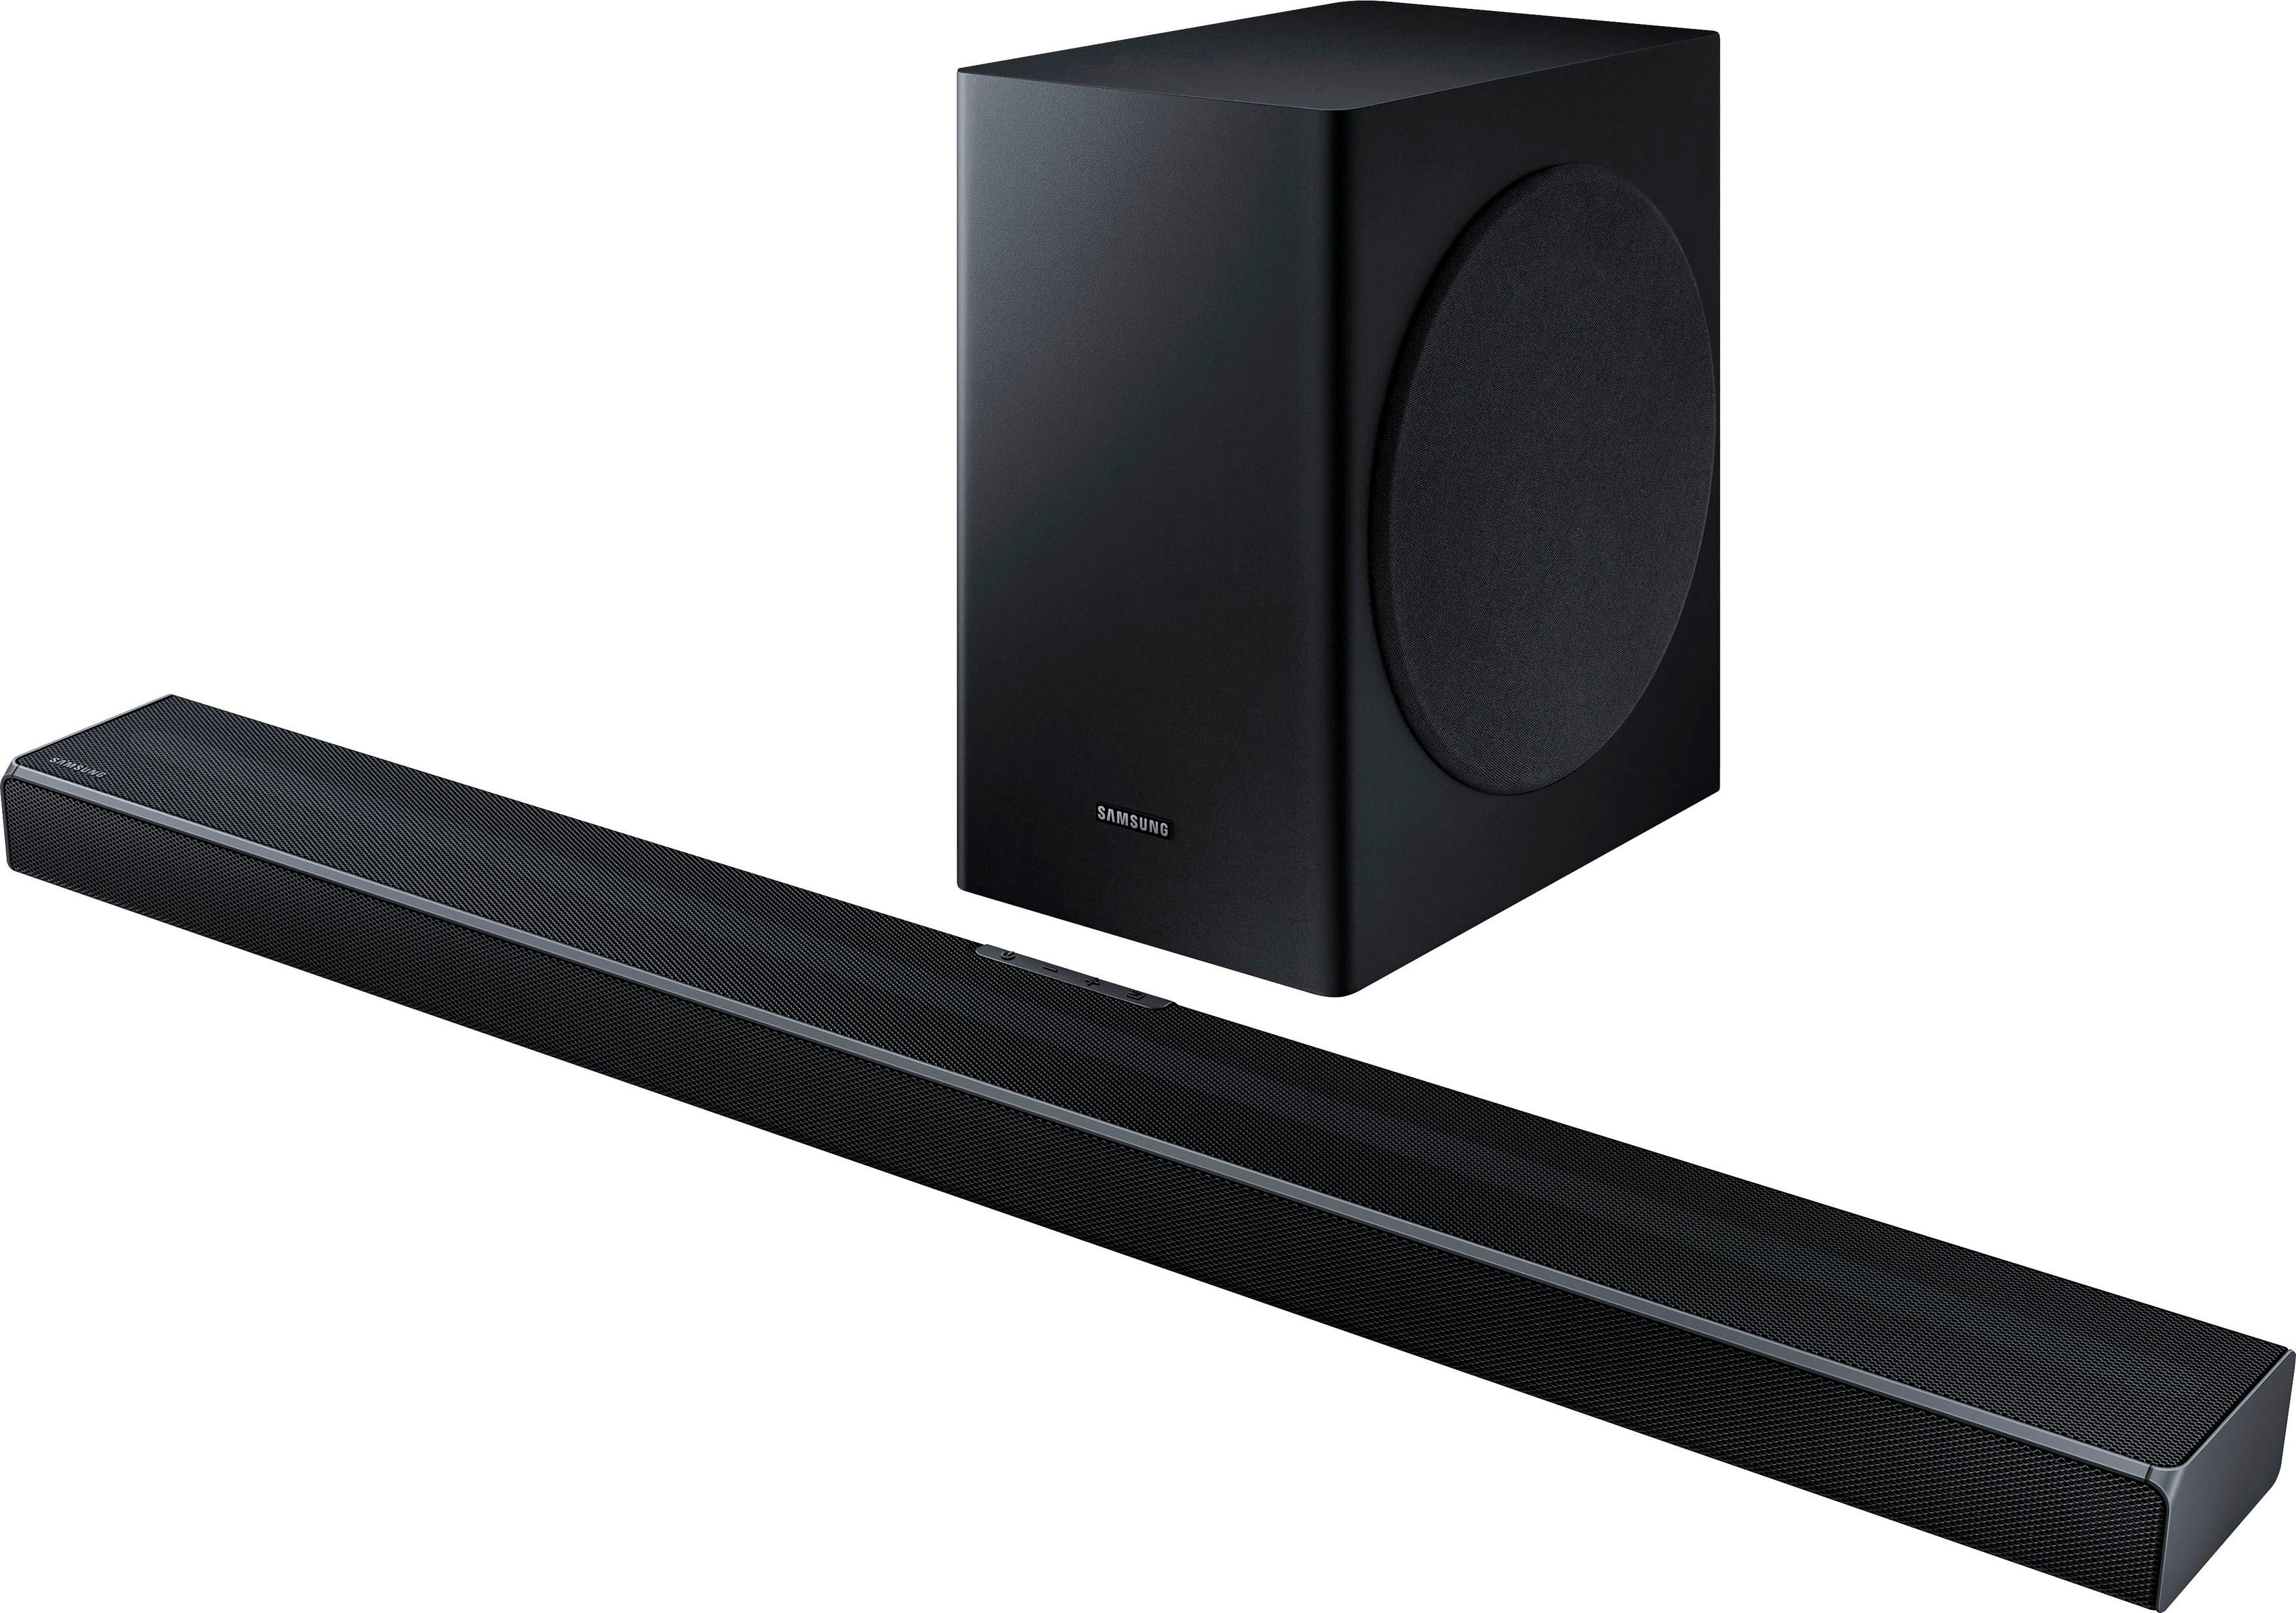 Samsung »HW-Q60T« soundbar nu online bestellen